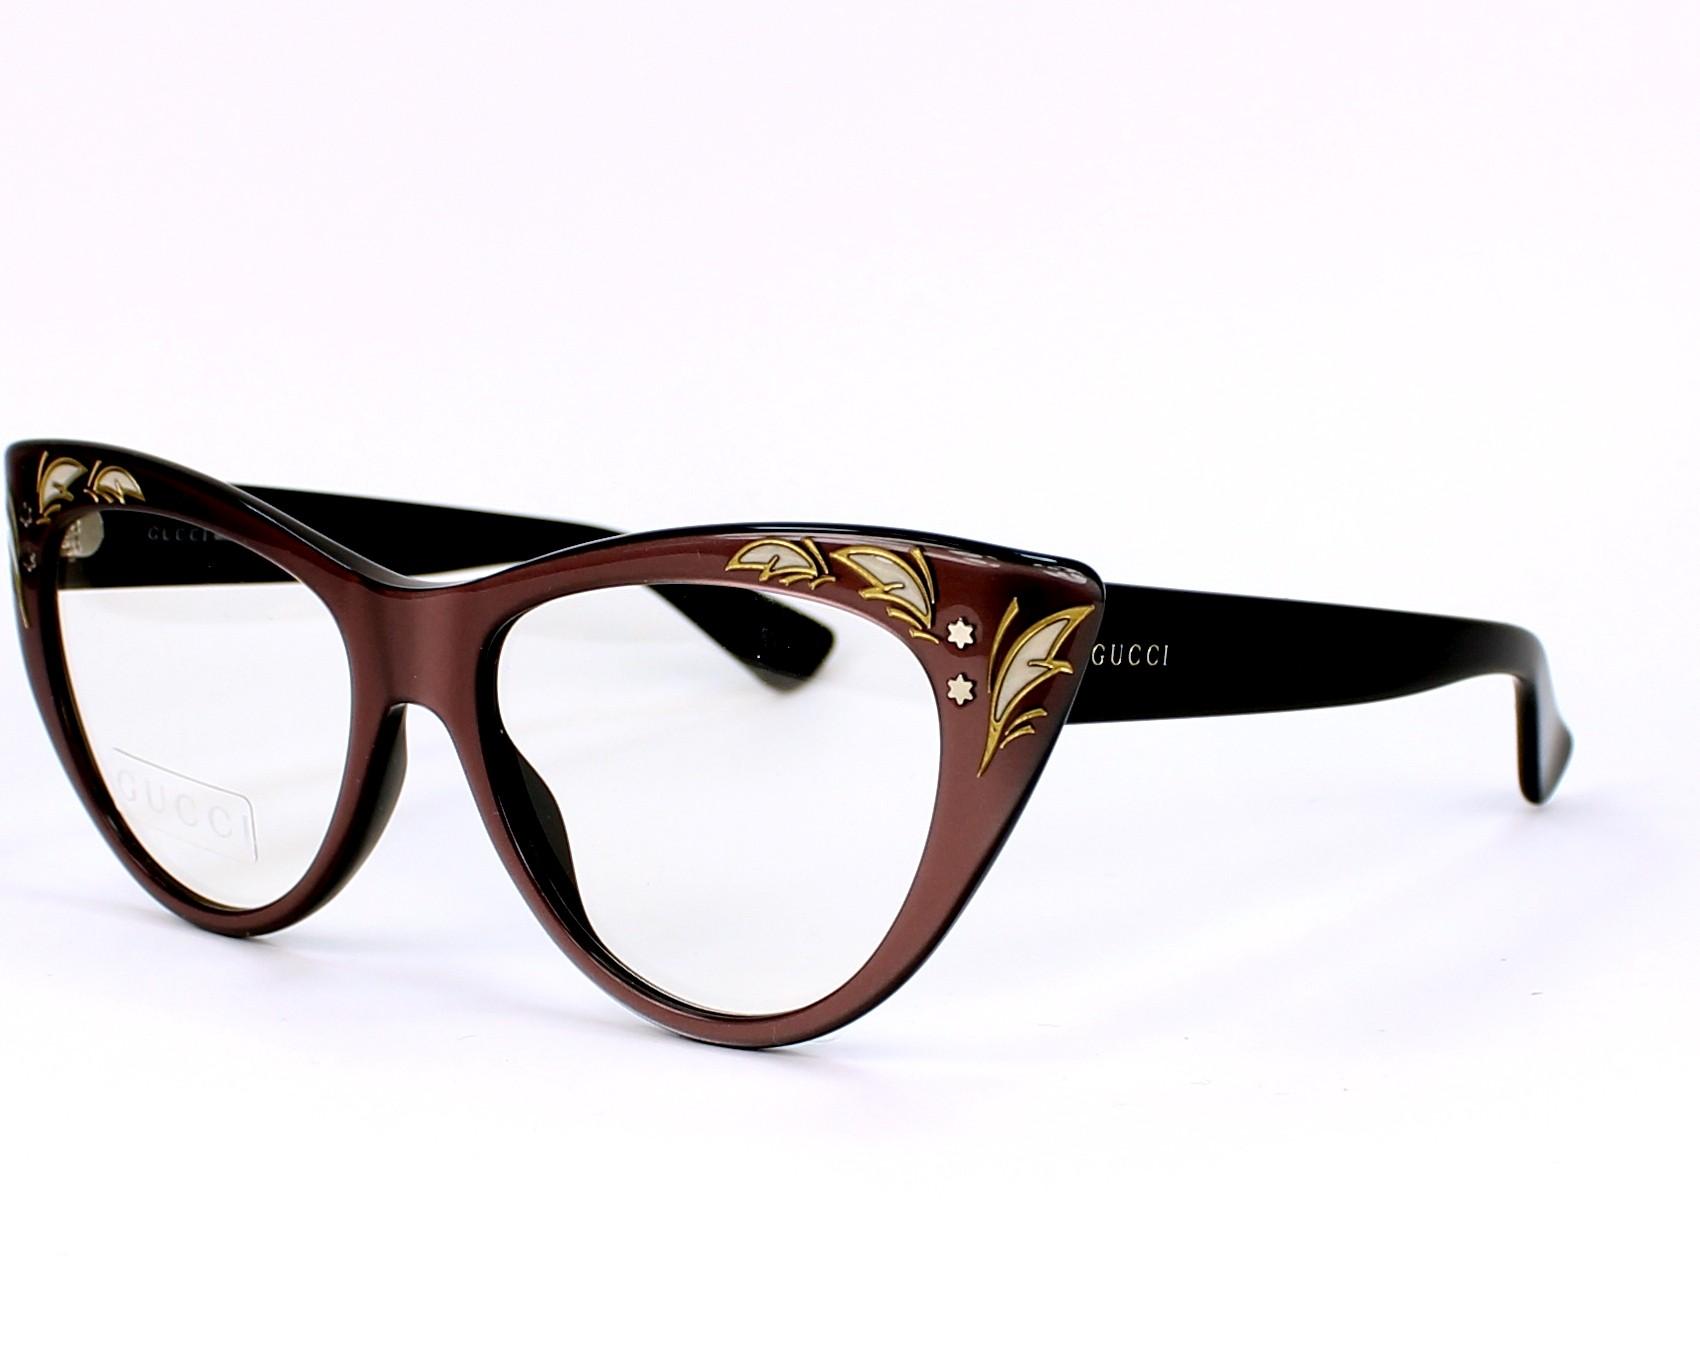 gucci 3806. eyeglasses gucci - gg 3806/s u4499 3806 c